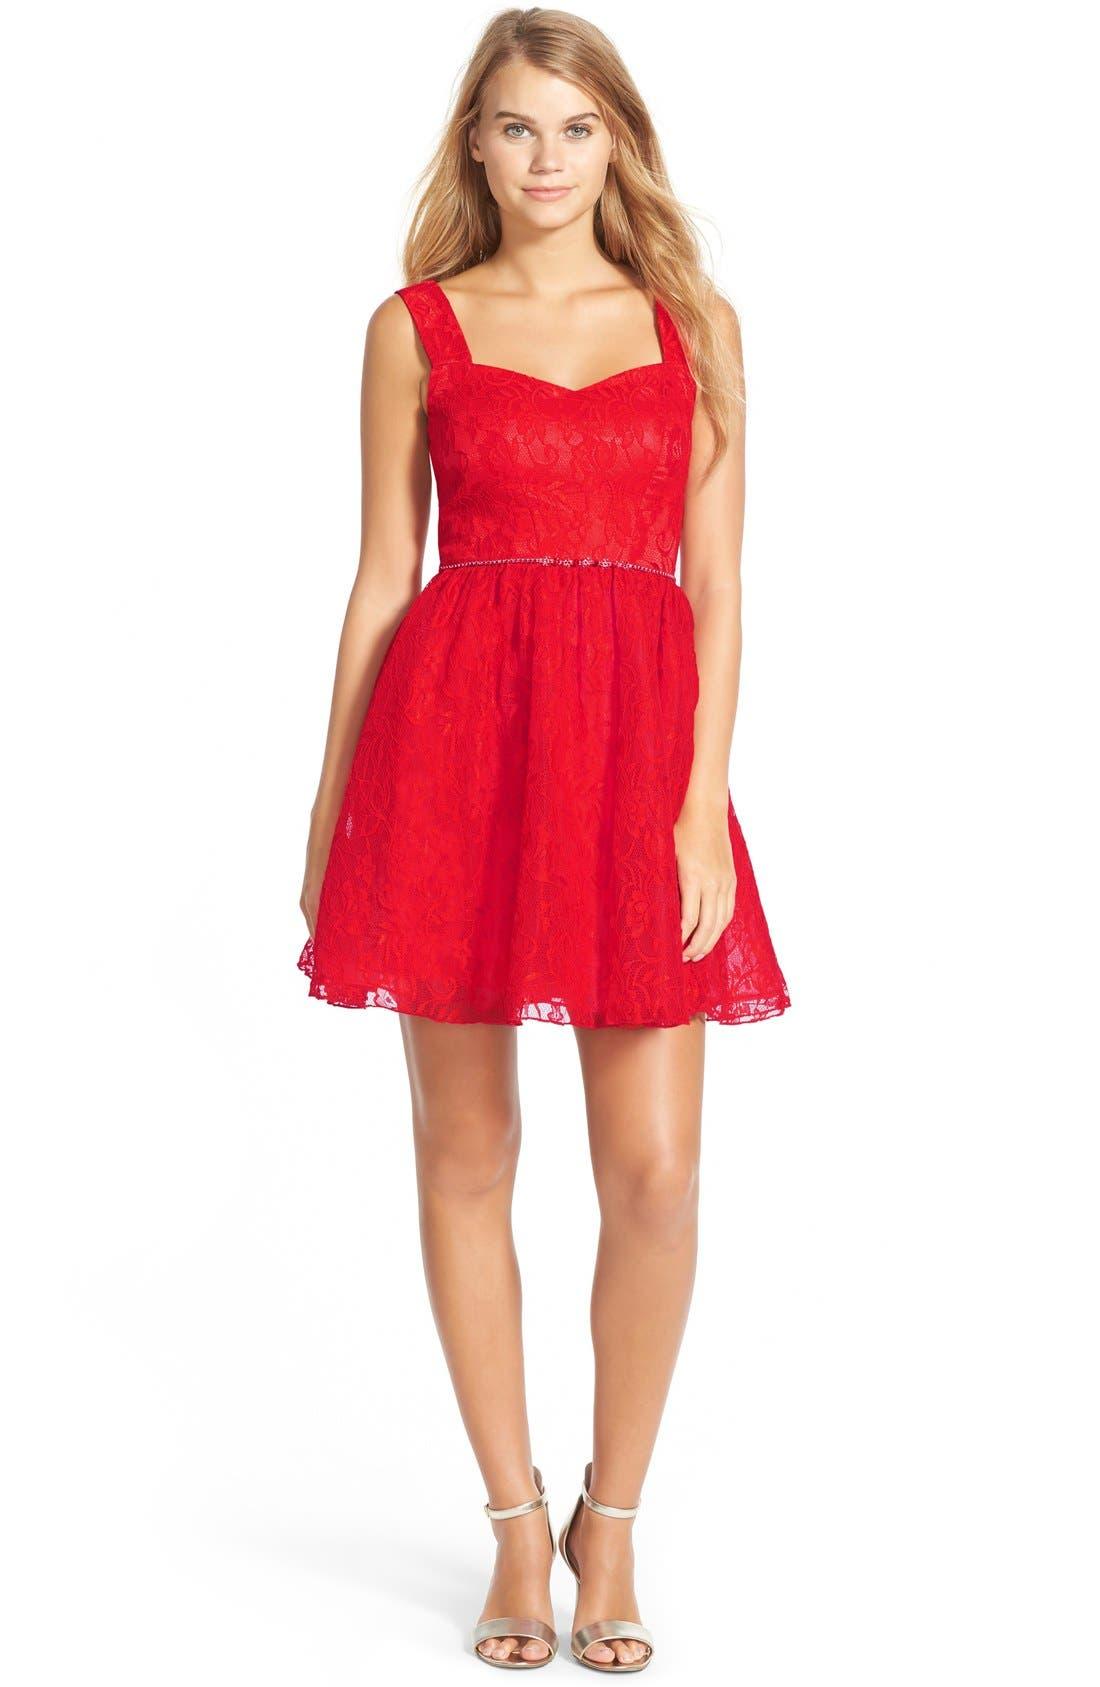 Lace Skater Dress,                             Main thumbnail 1, color,                             600